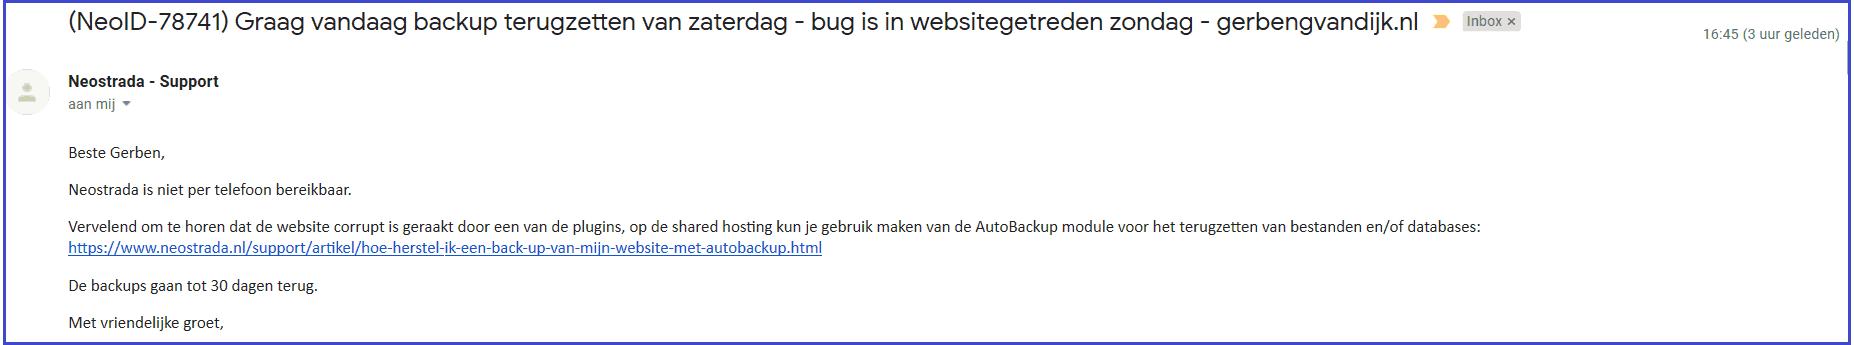 Backup terugzetten hosting Neostrada